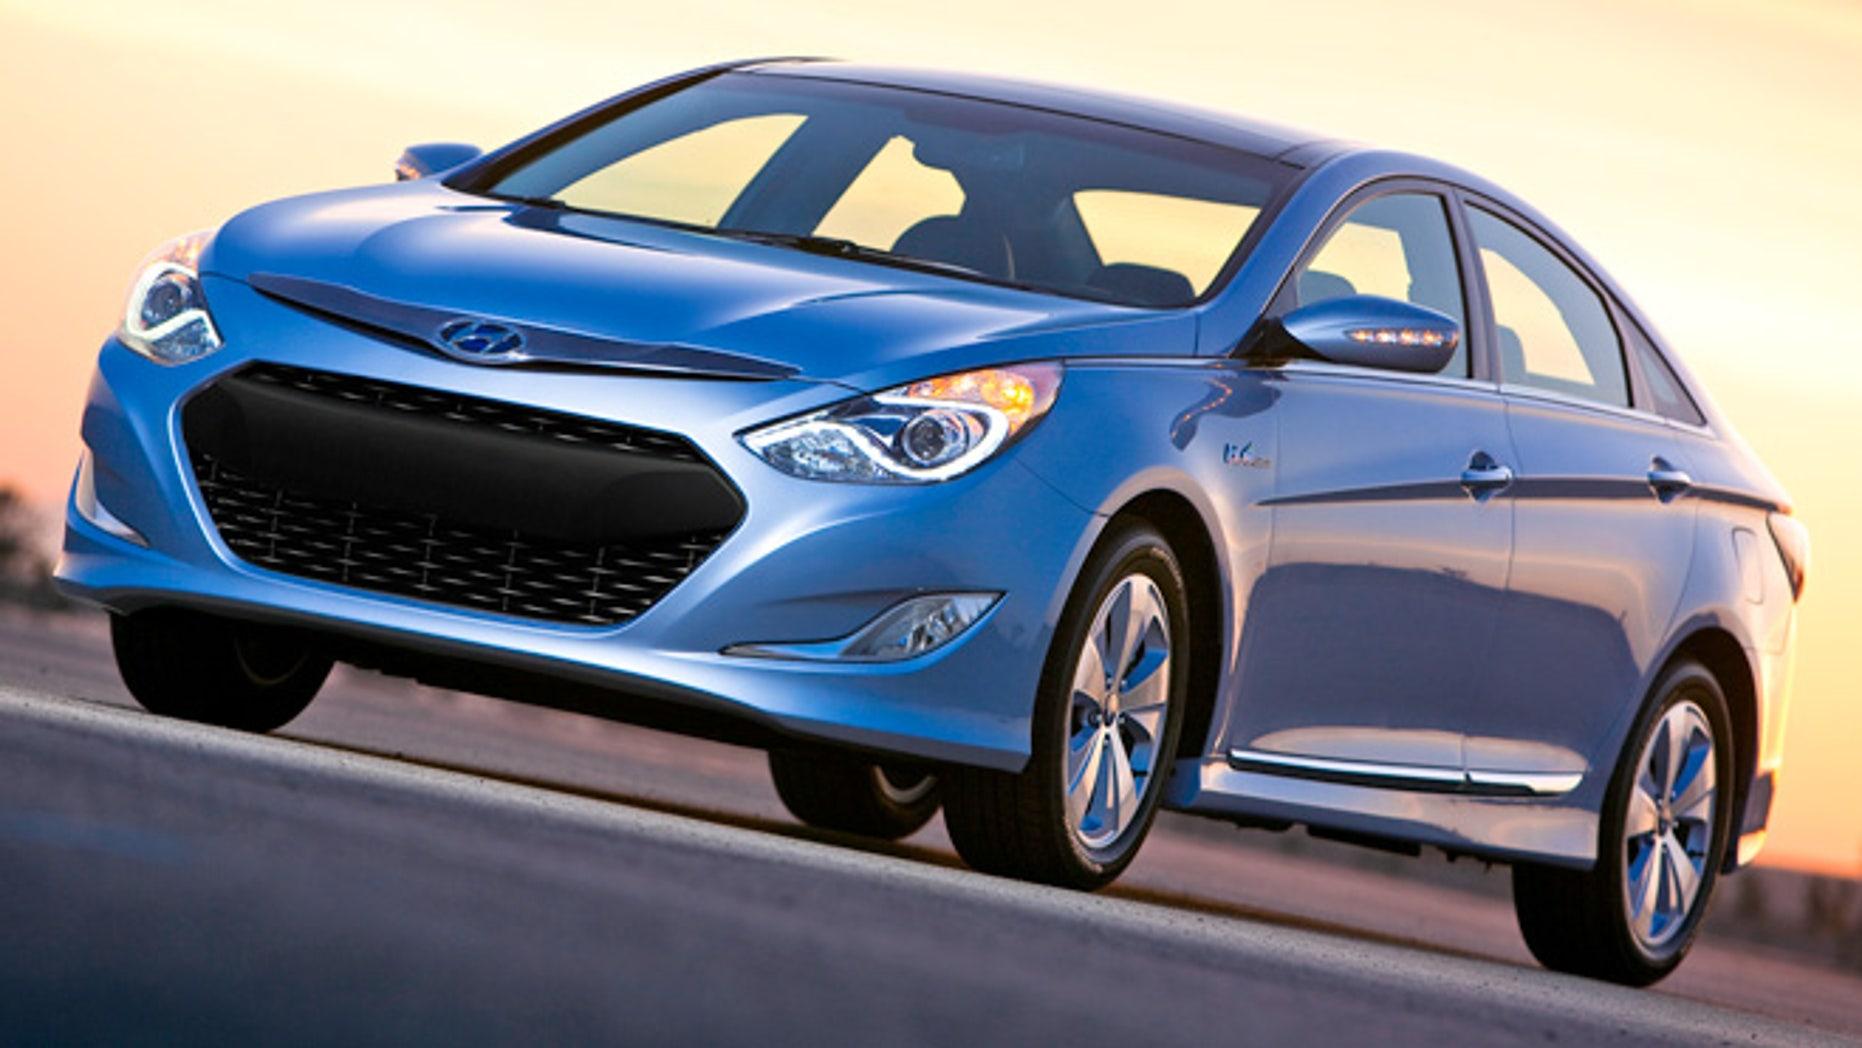 Epa Finds Hyundai Kia Overstated Gas Mileage